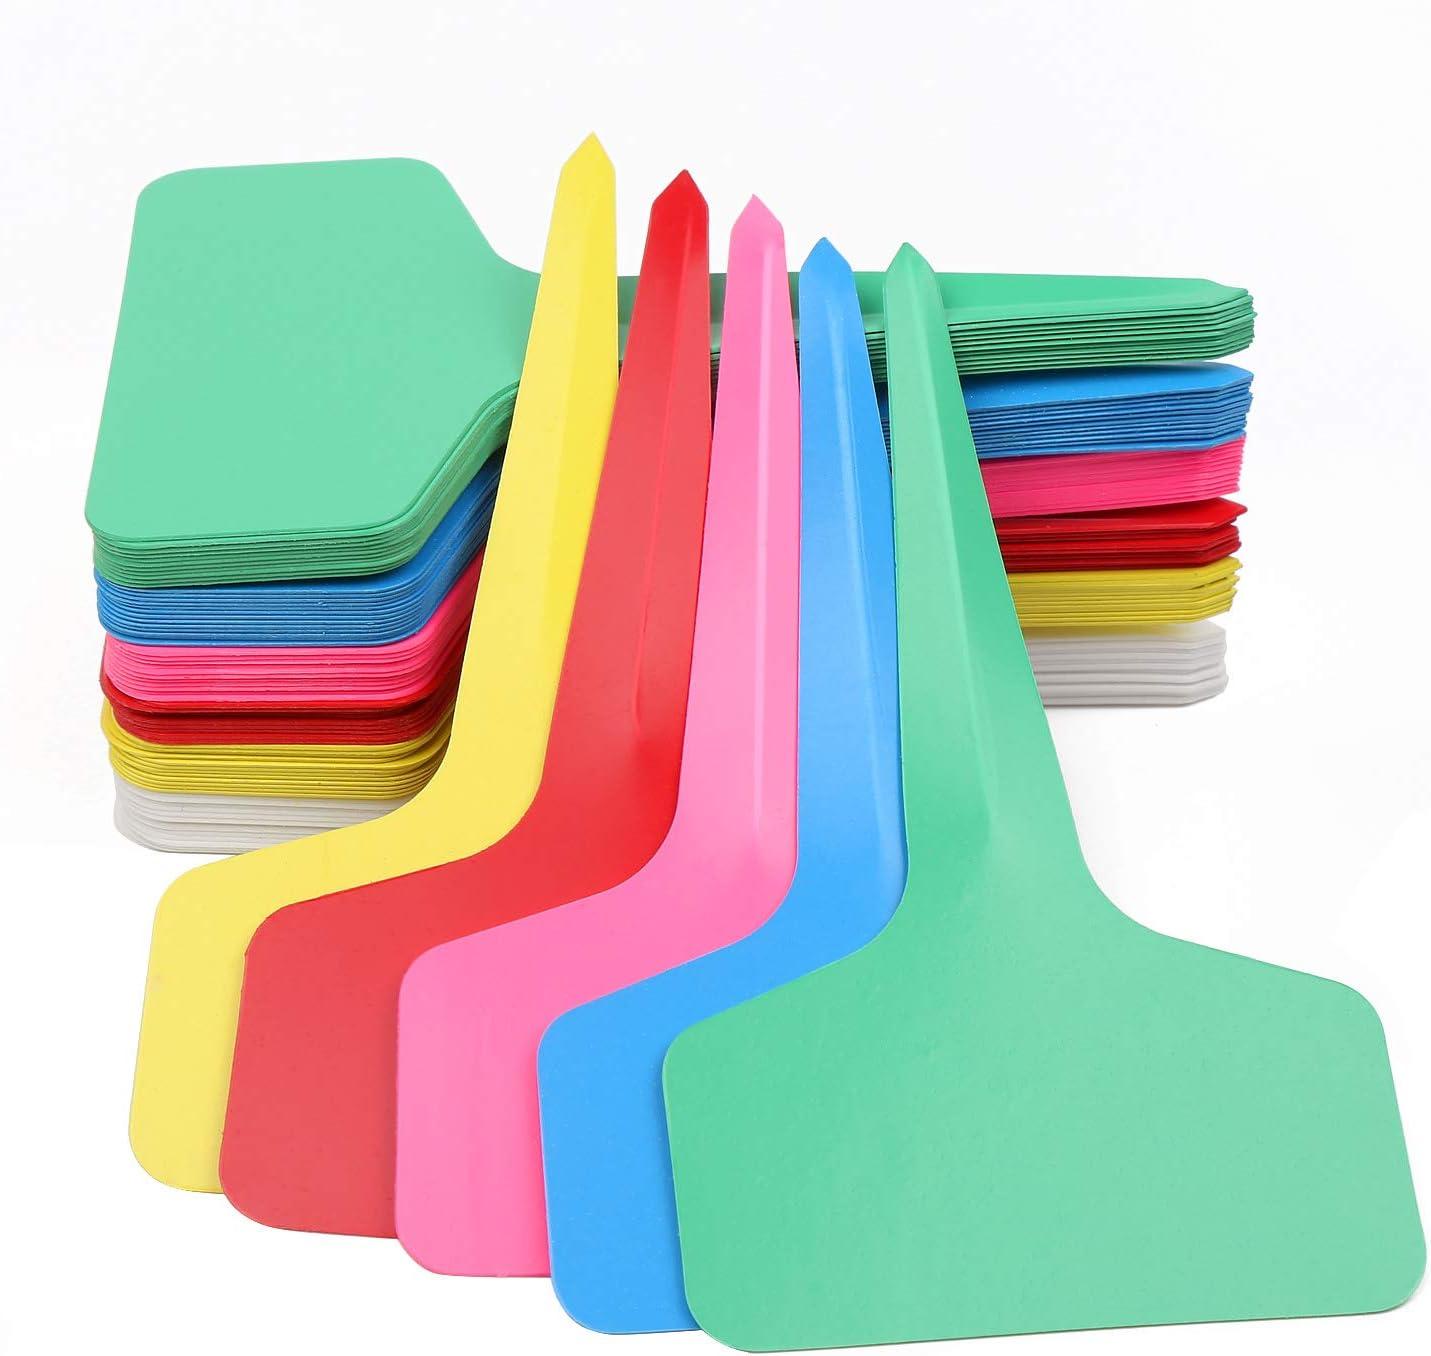 1Pack Lifreer 120PCS Garden Plant Labels Plastic Tags Garden Kit Tools S 3pcs